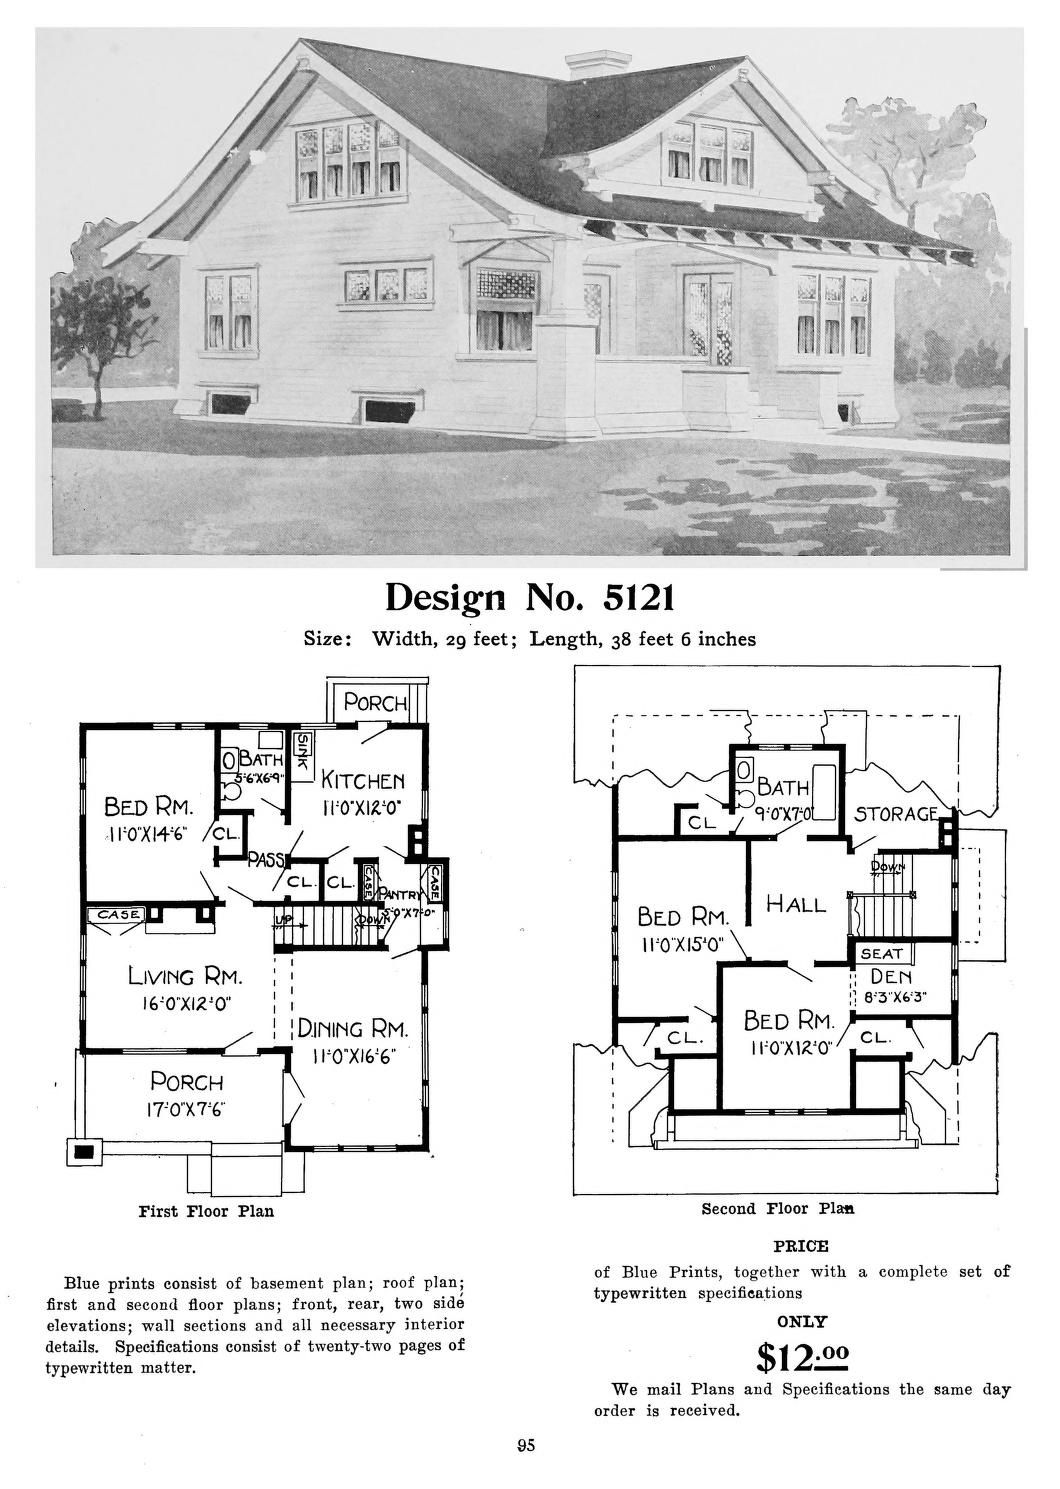 Radford S Artistic Bungalows House Catalog 1908 Design 5121 Craftsman Bungalow Exterior Vintage House Plans Craftsman House